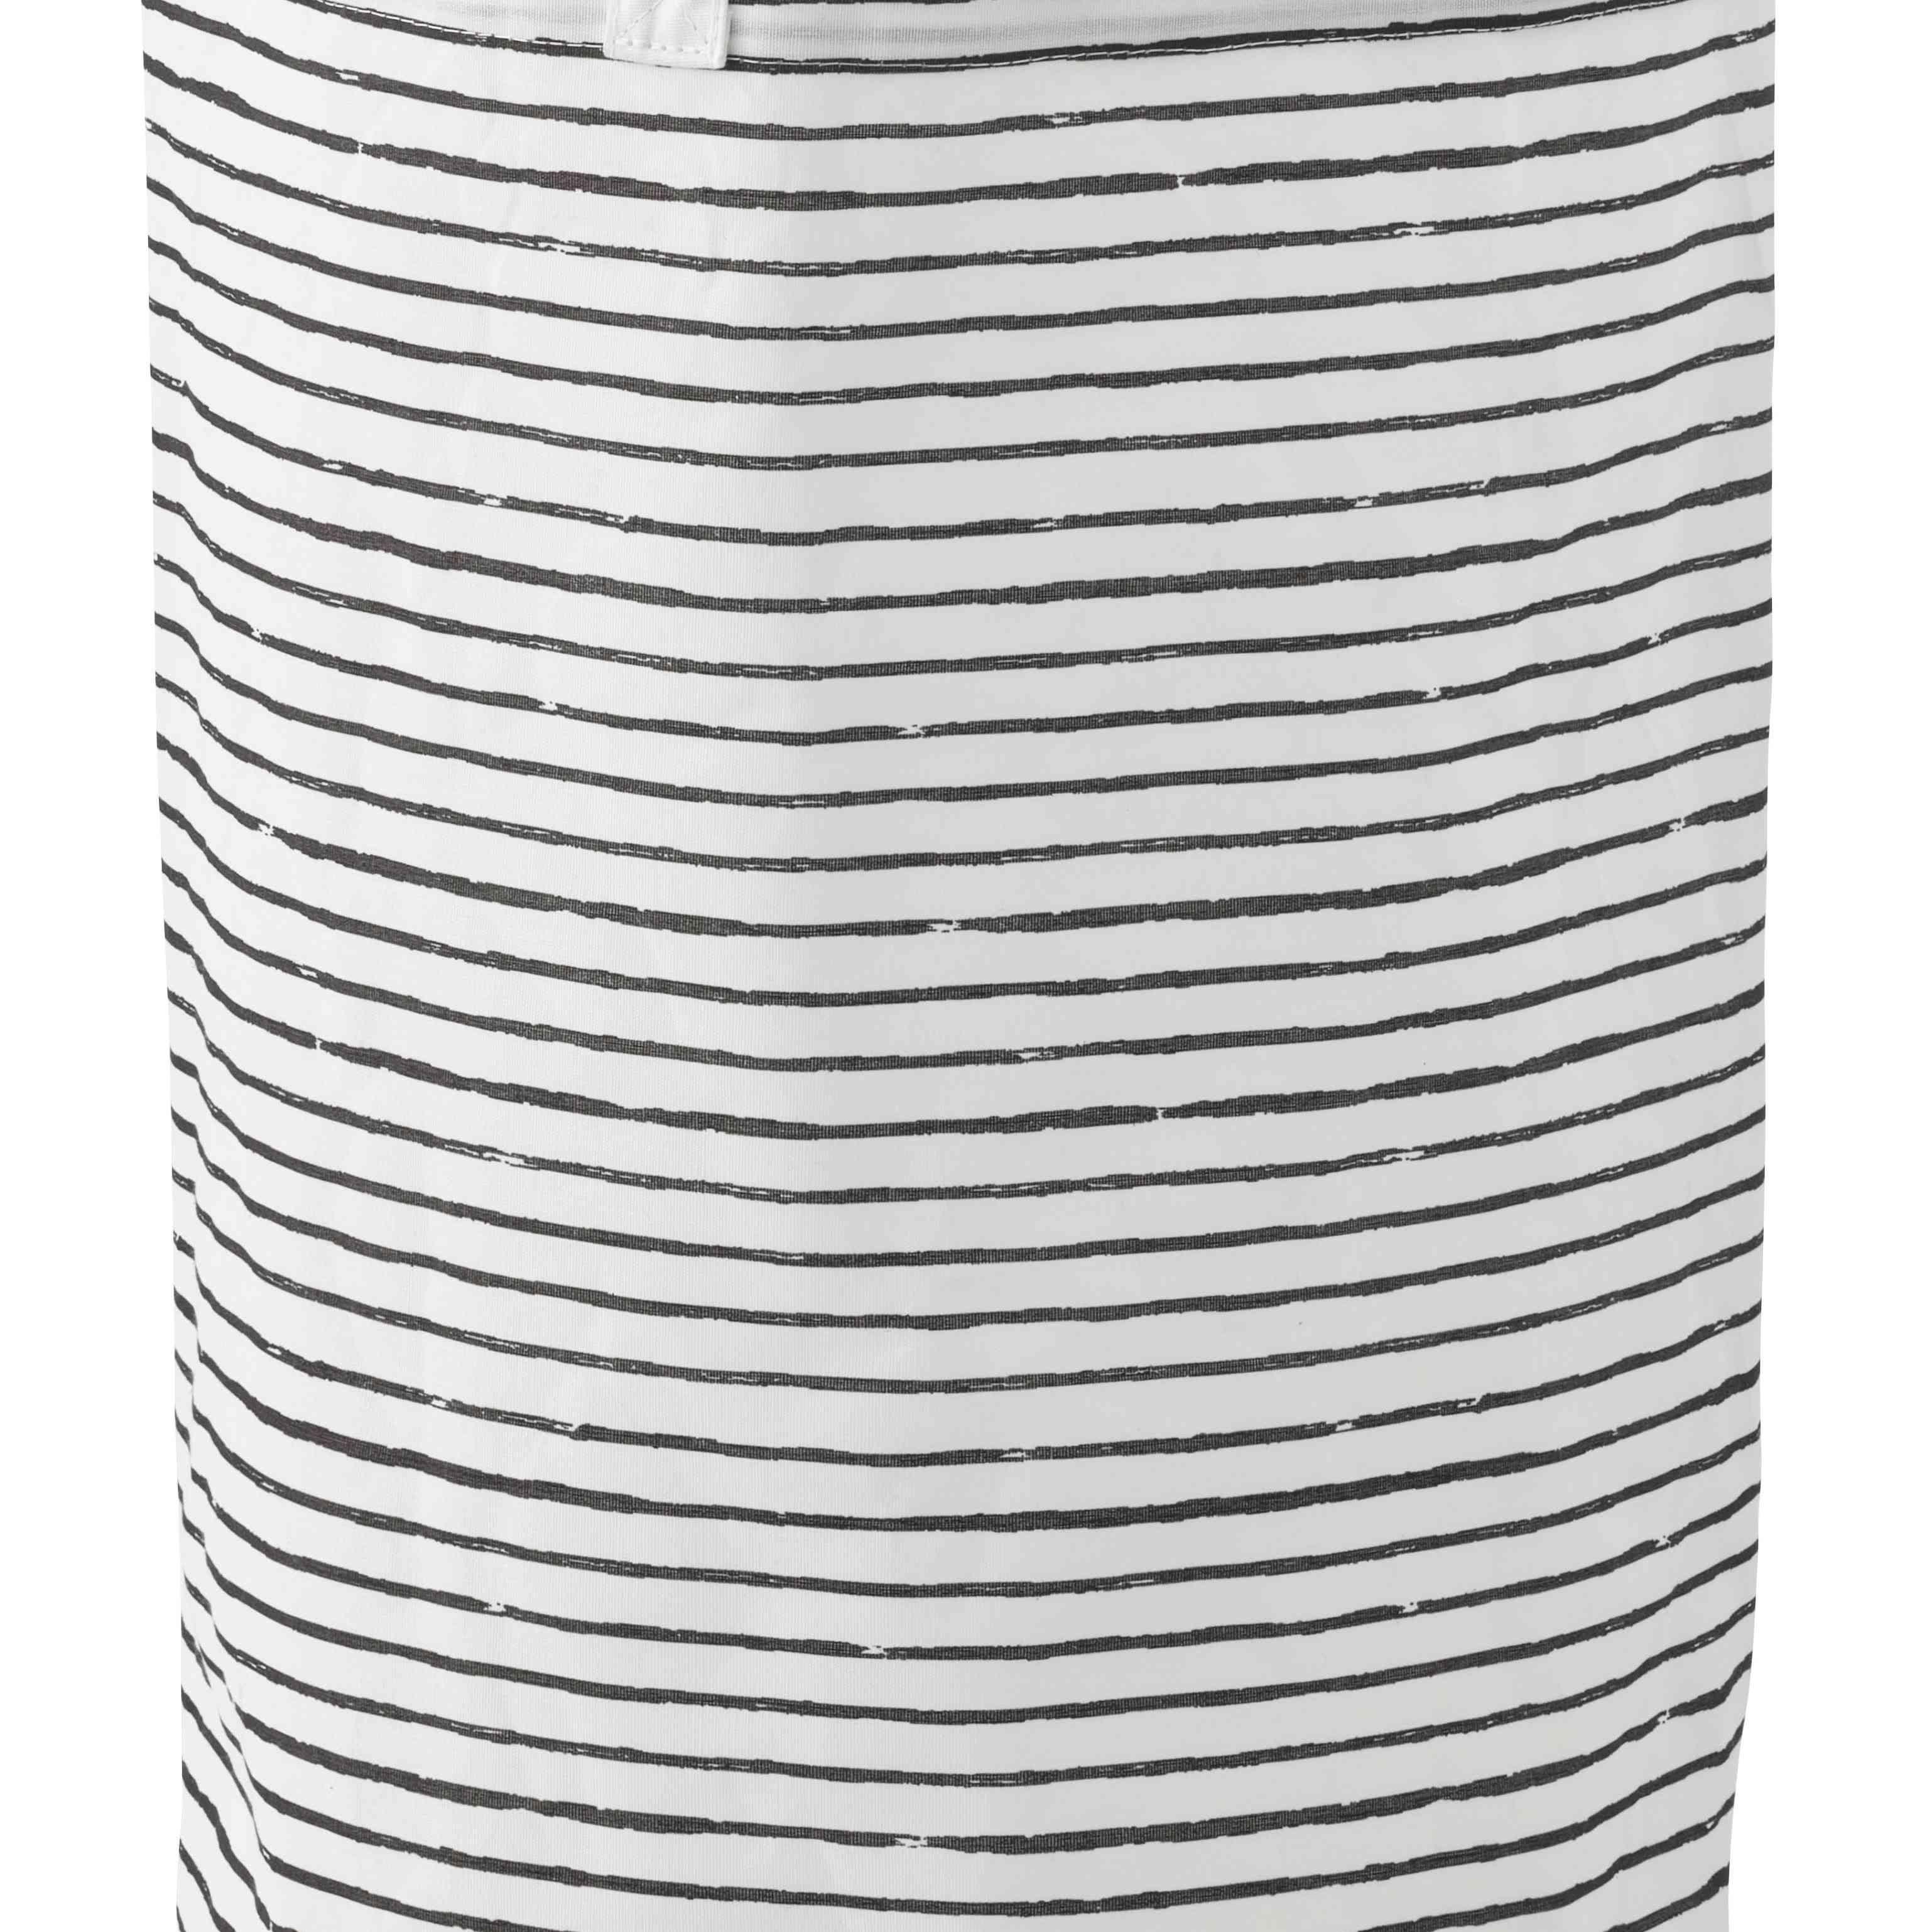 IKEA KLUNKA Laundry Bag, White/Black 16 Gallon